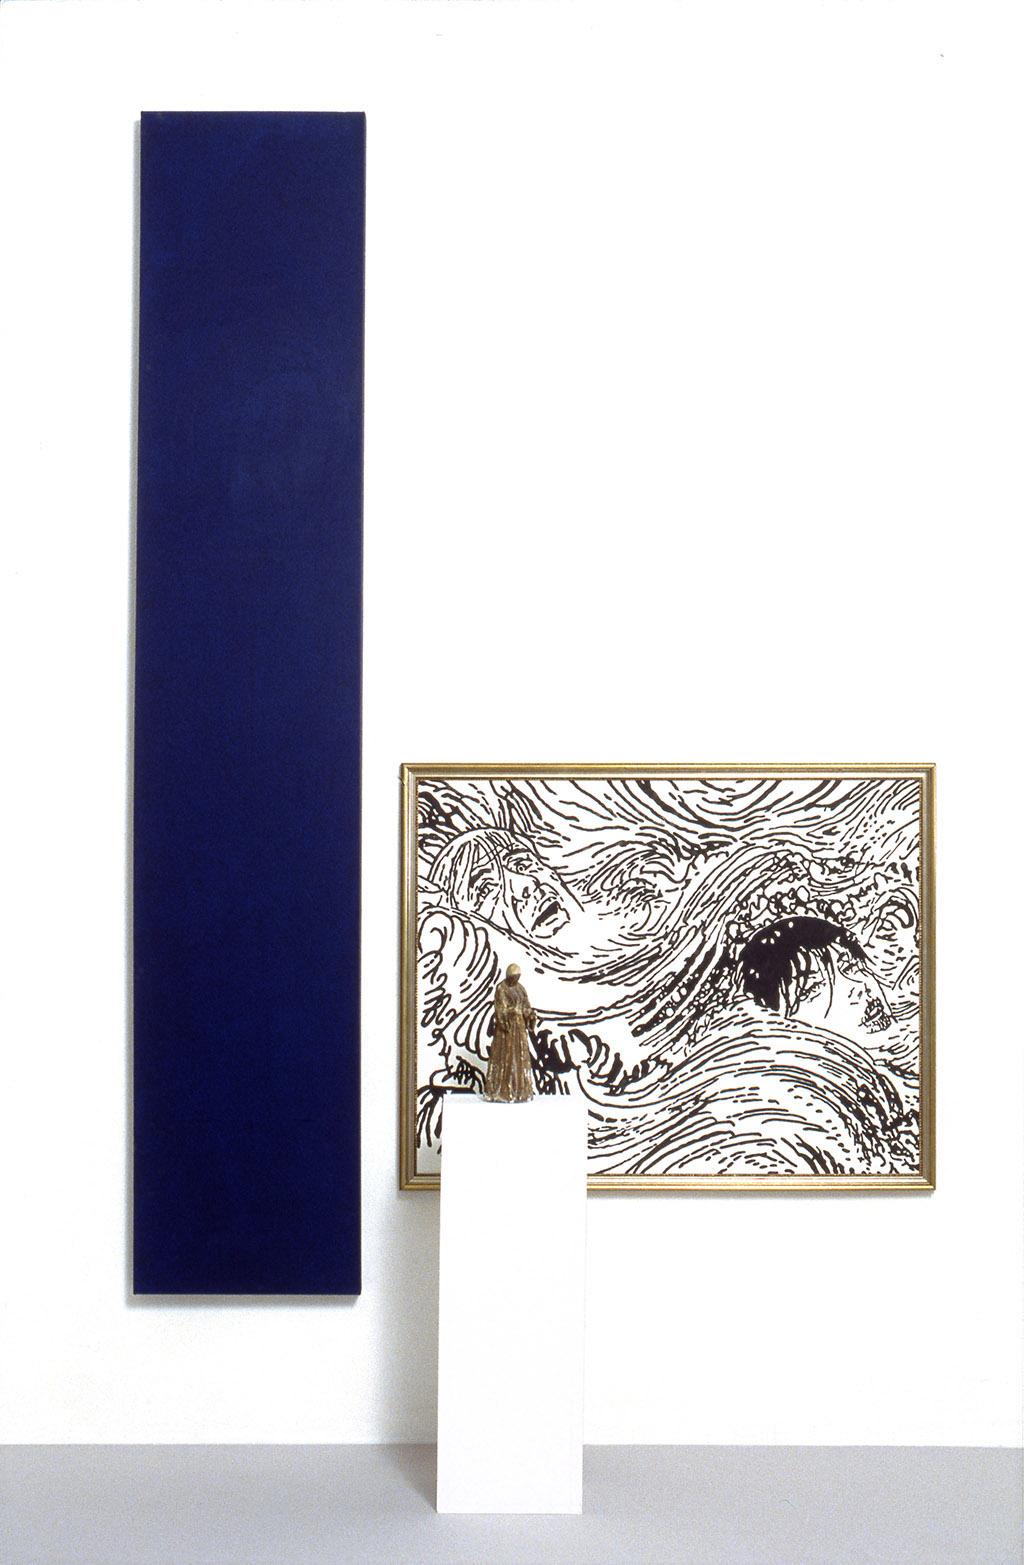 Domestic Arrangement 14 (Infinitely Blue 2) 1987